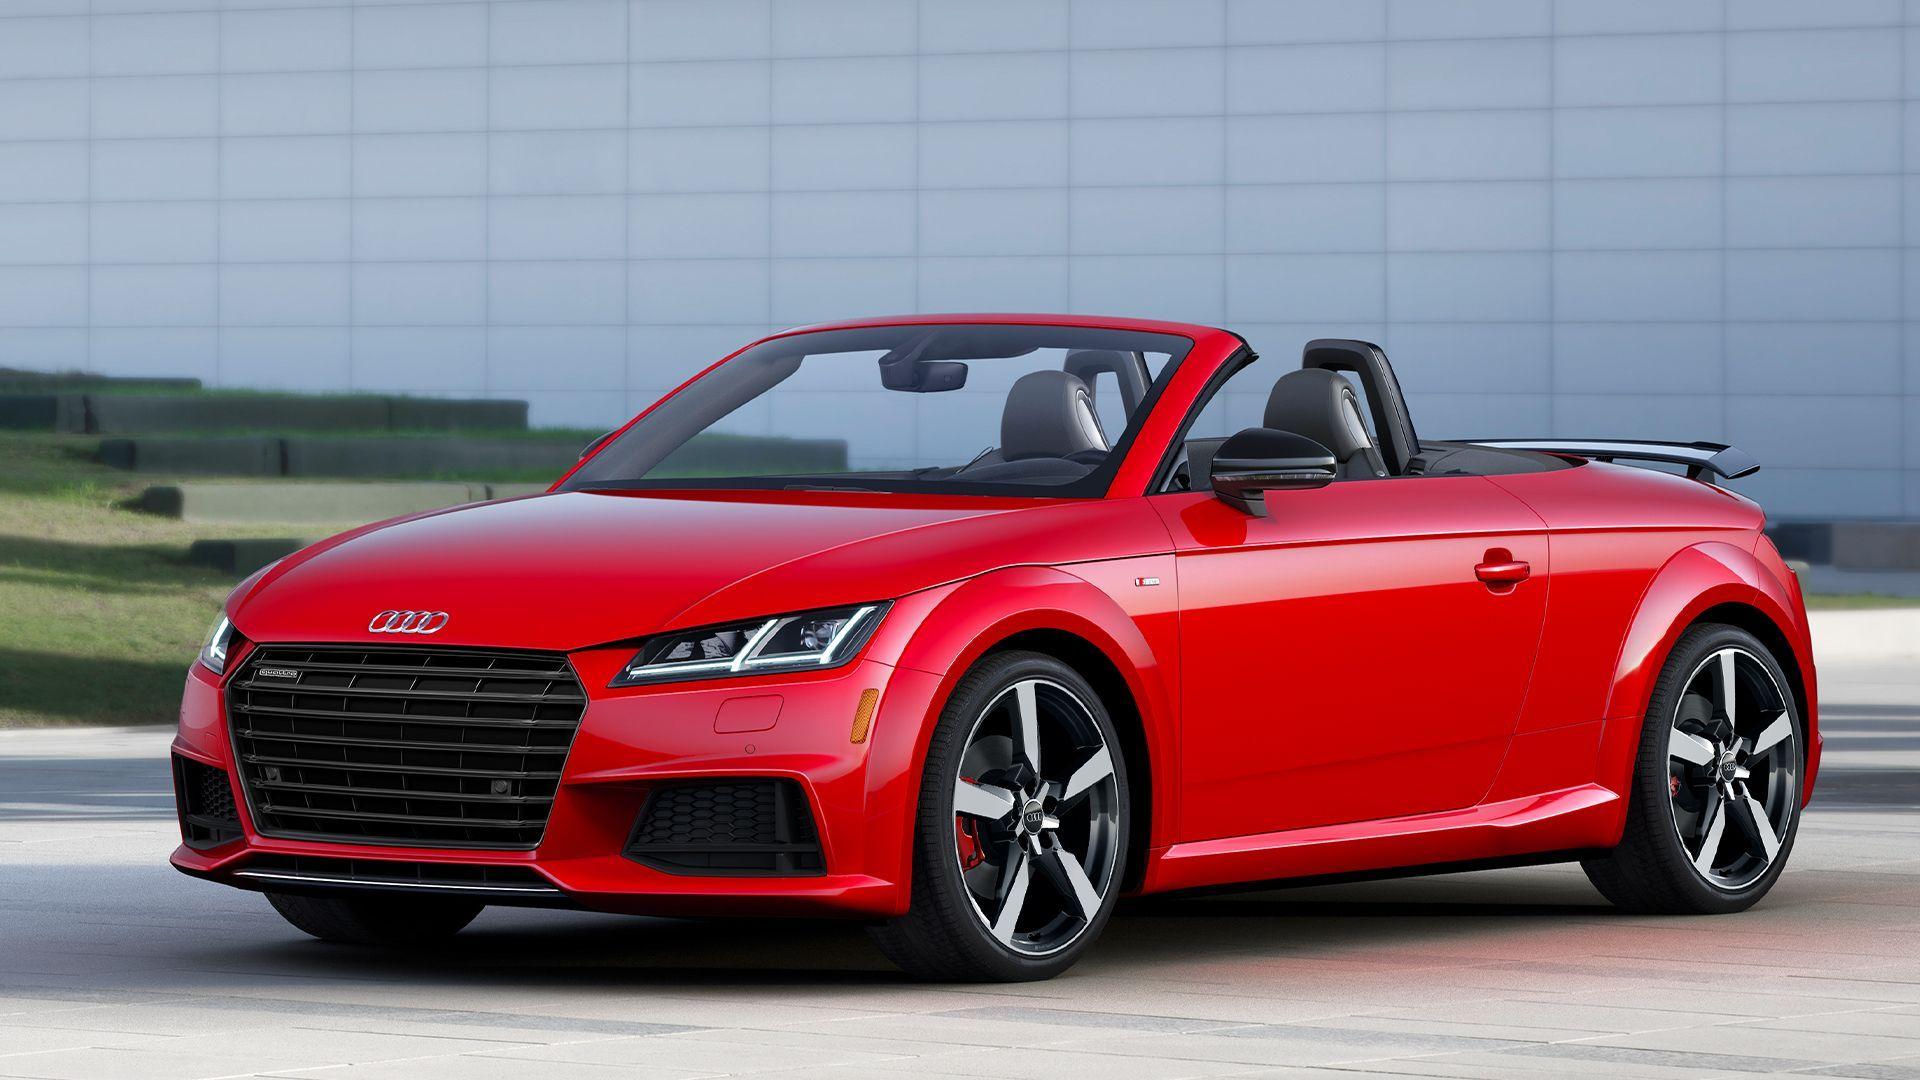 2021 TT Roadster | Overview | Audi USA